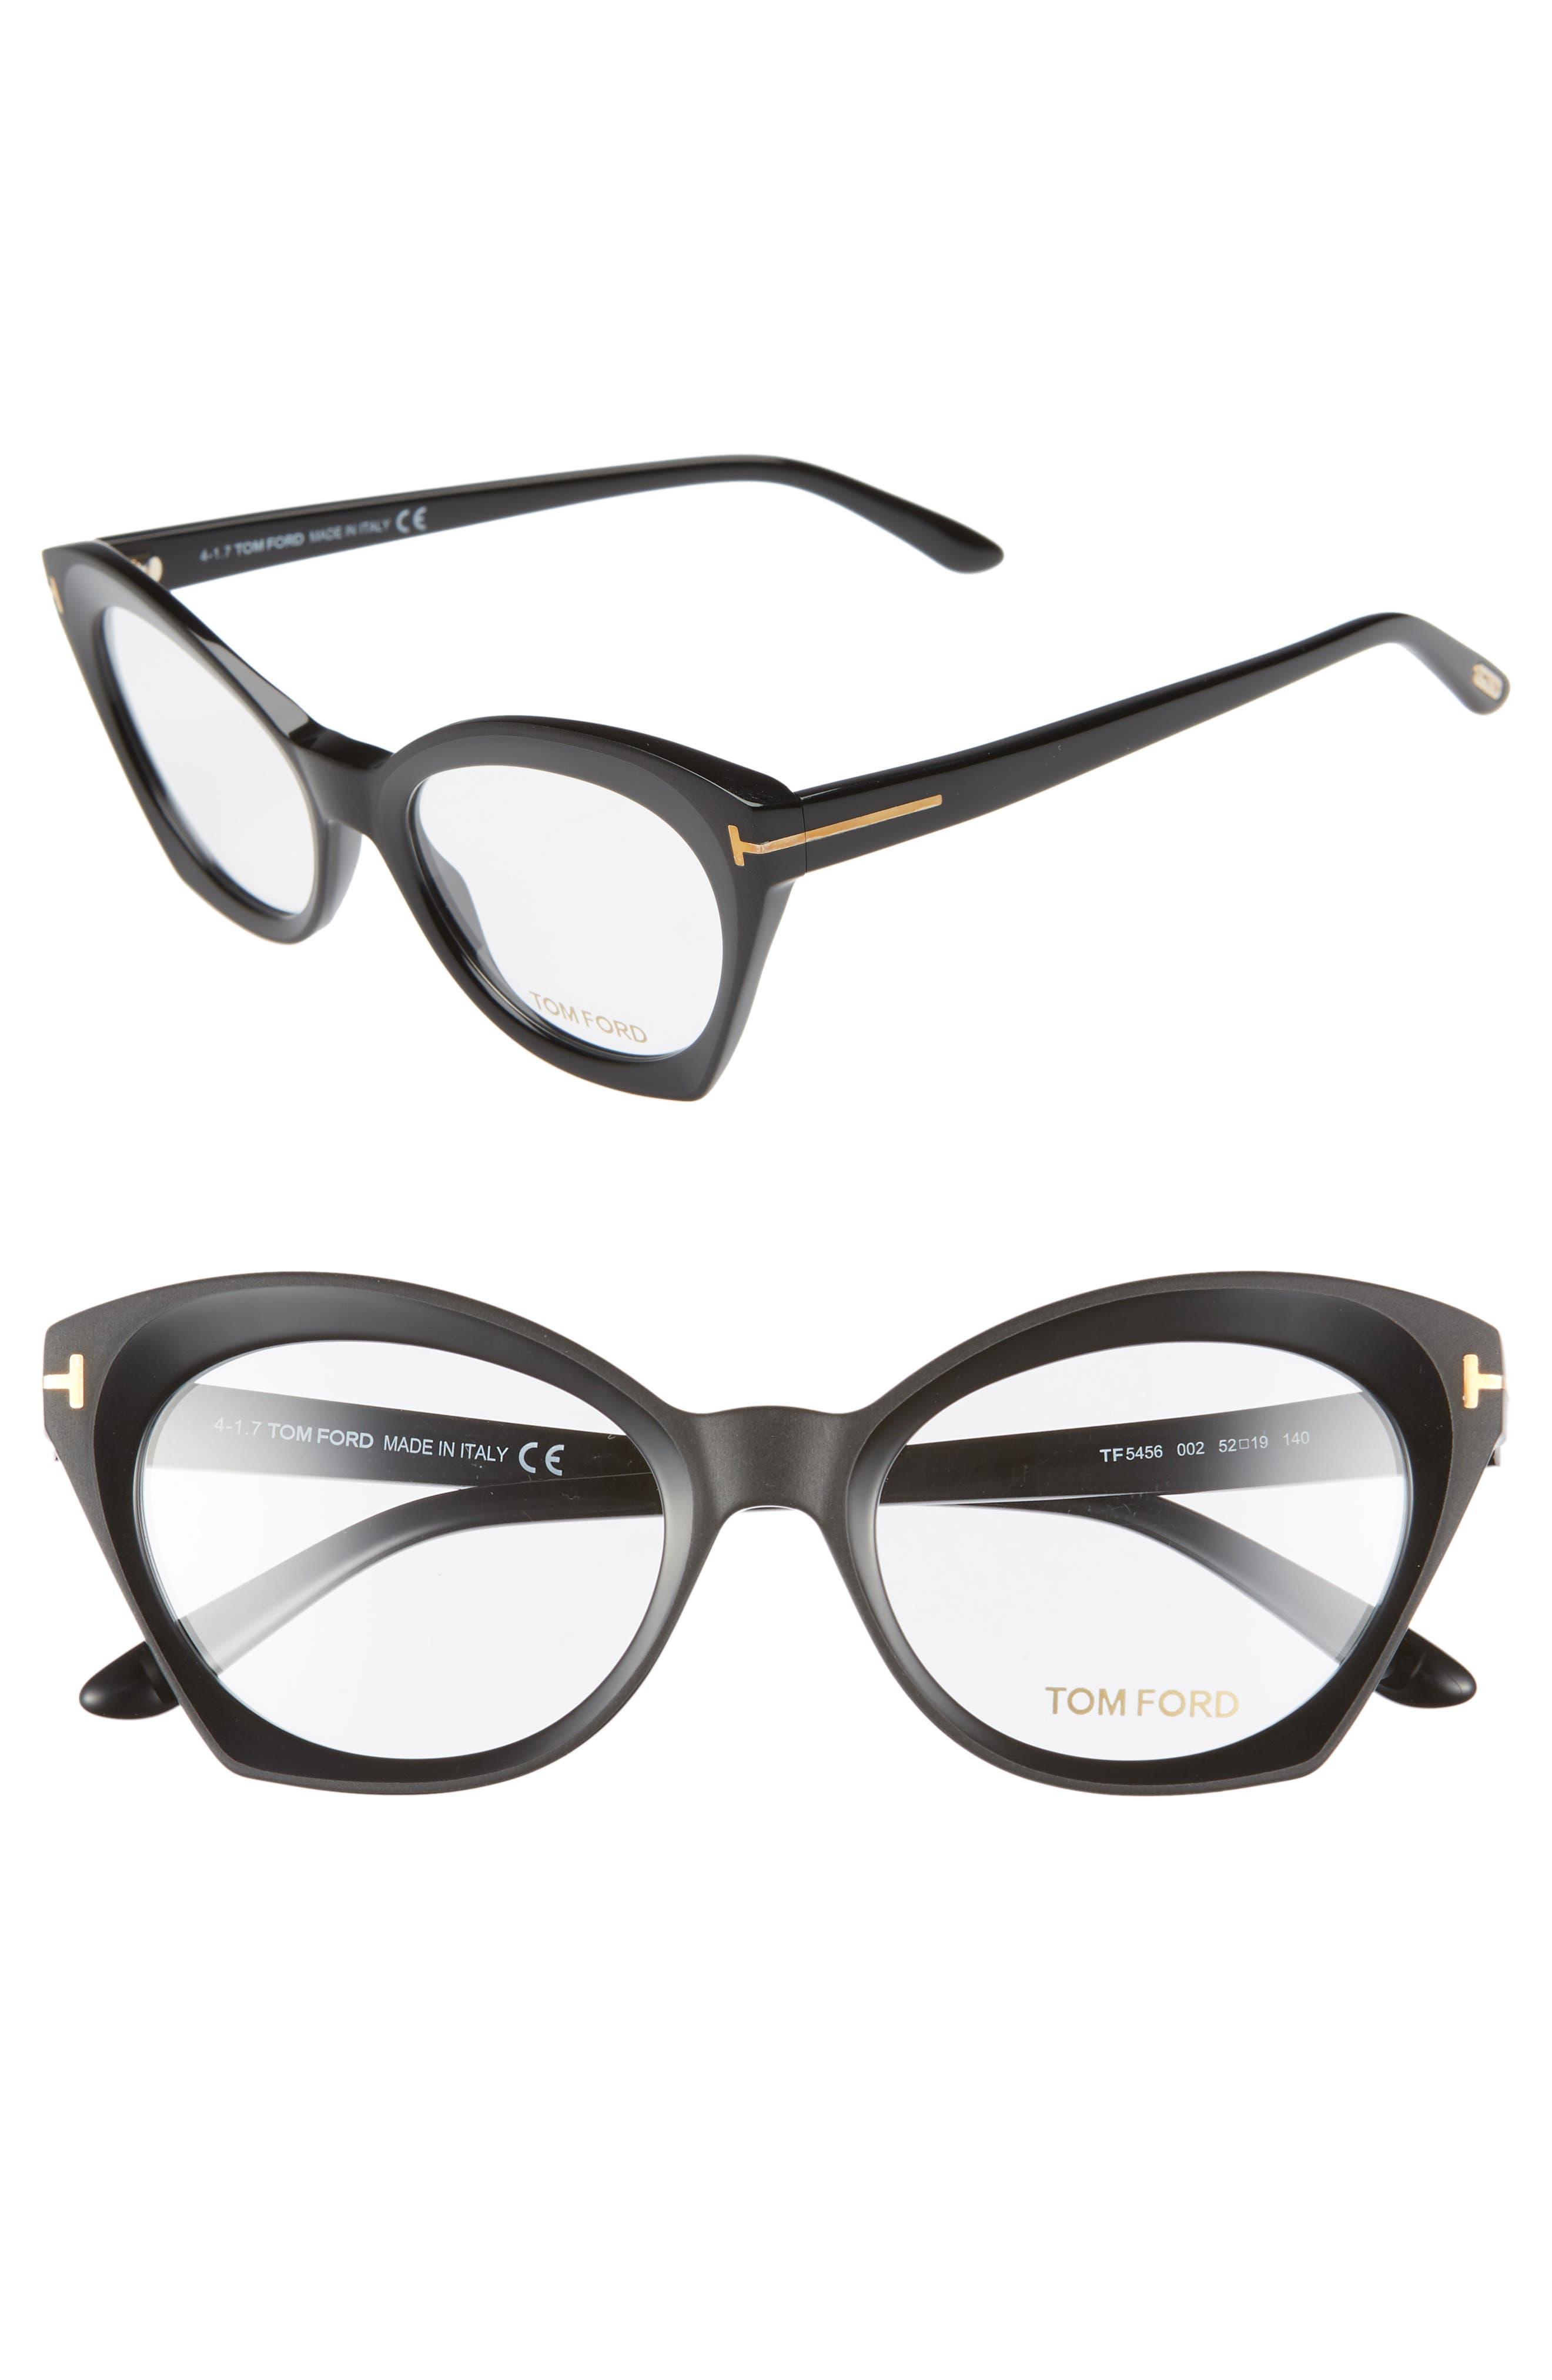 52mm Optical Glasses,                         Main,                         color, SHINY BLACK/ SHINY ROSE GOLD